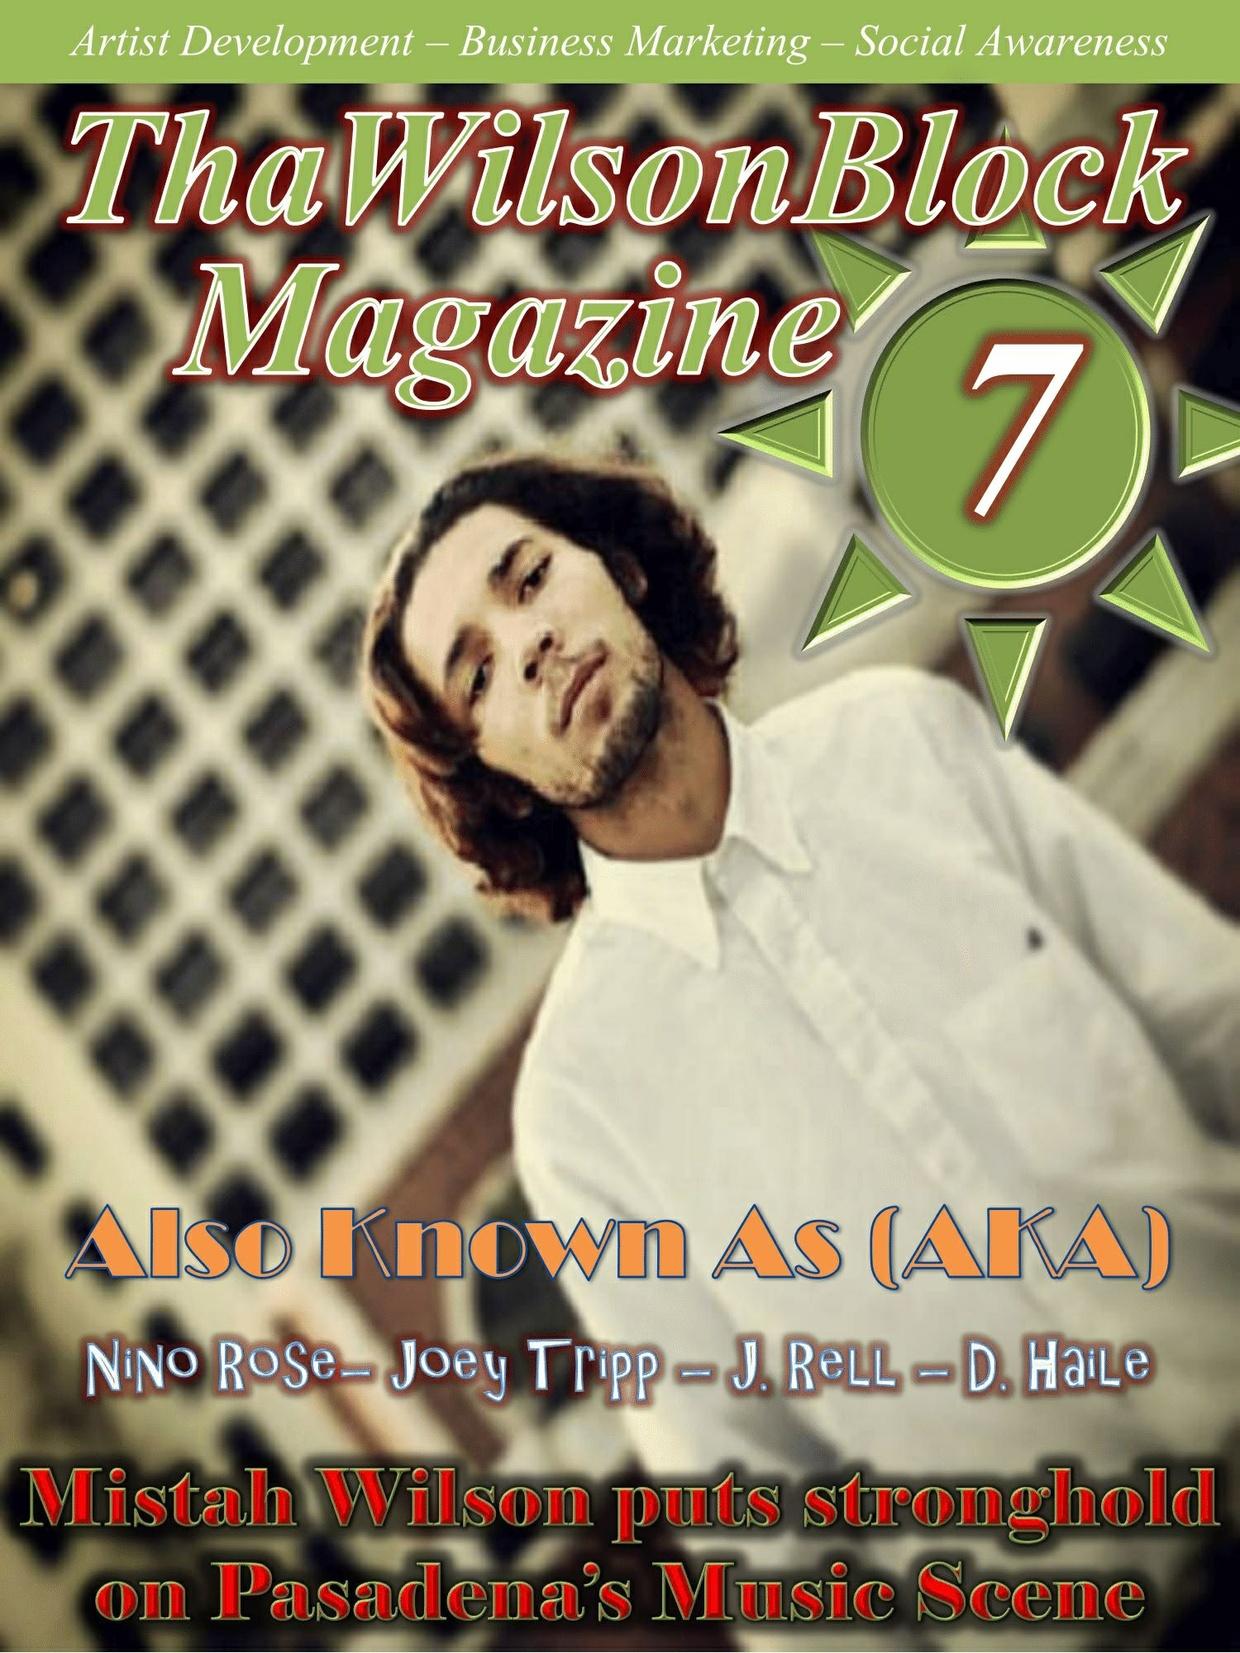 ThaWilsonBlock Magazine Issue7